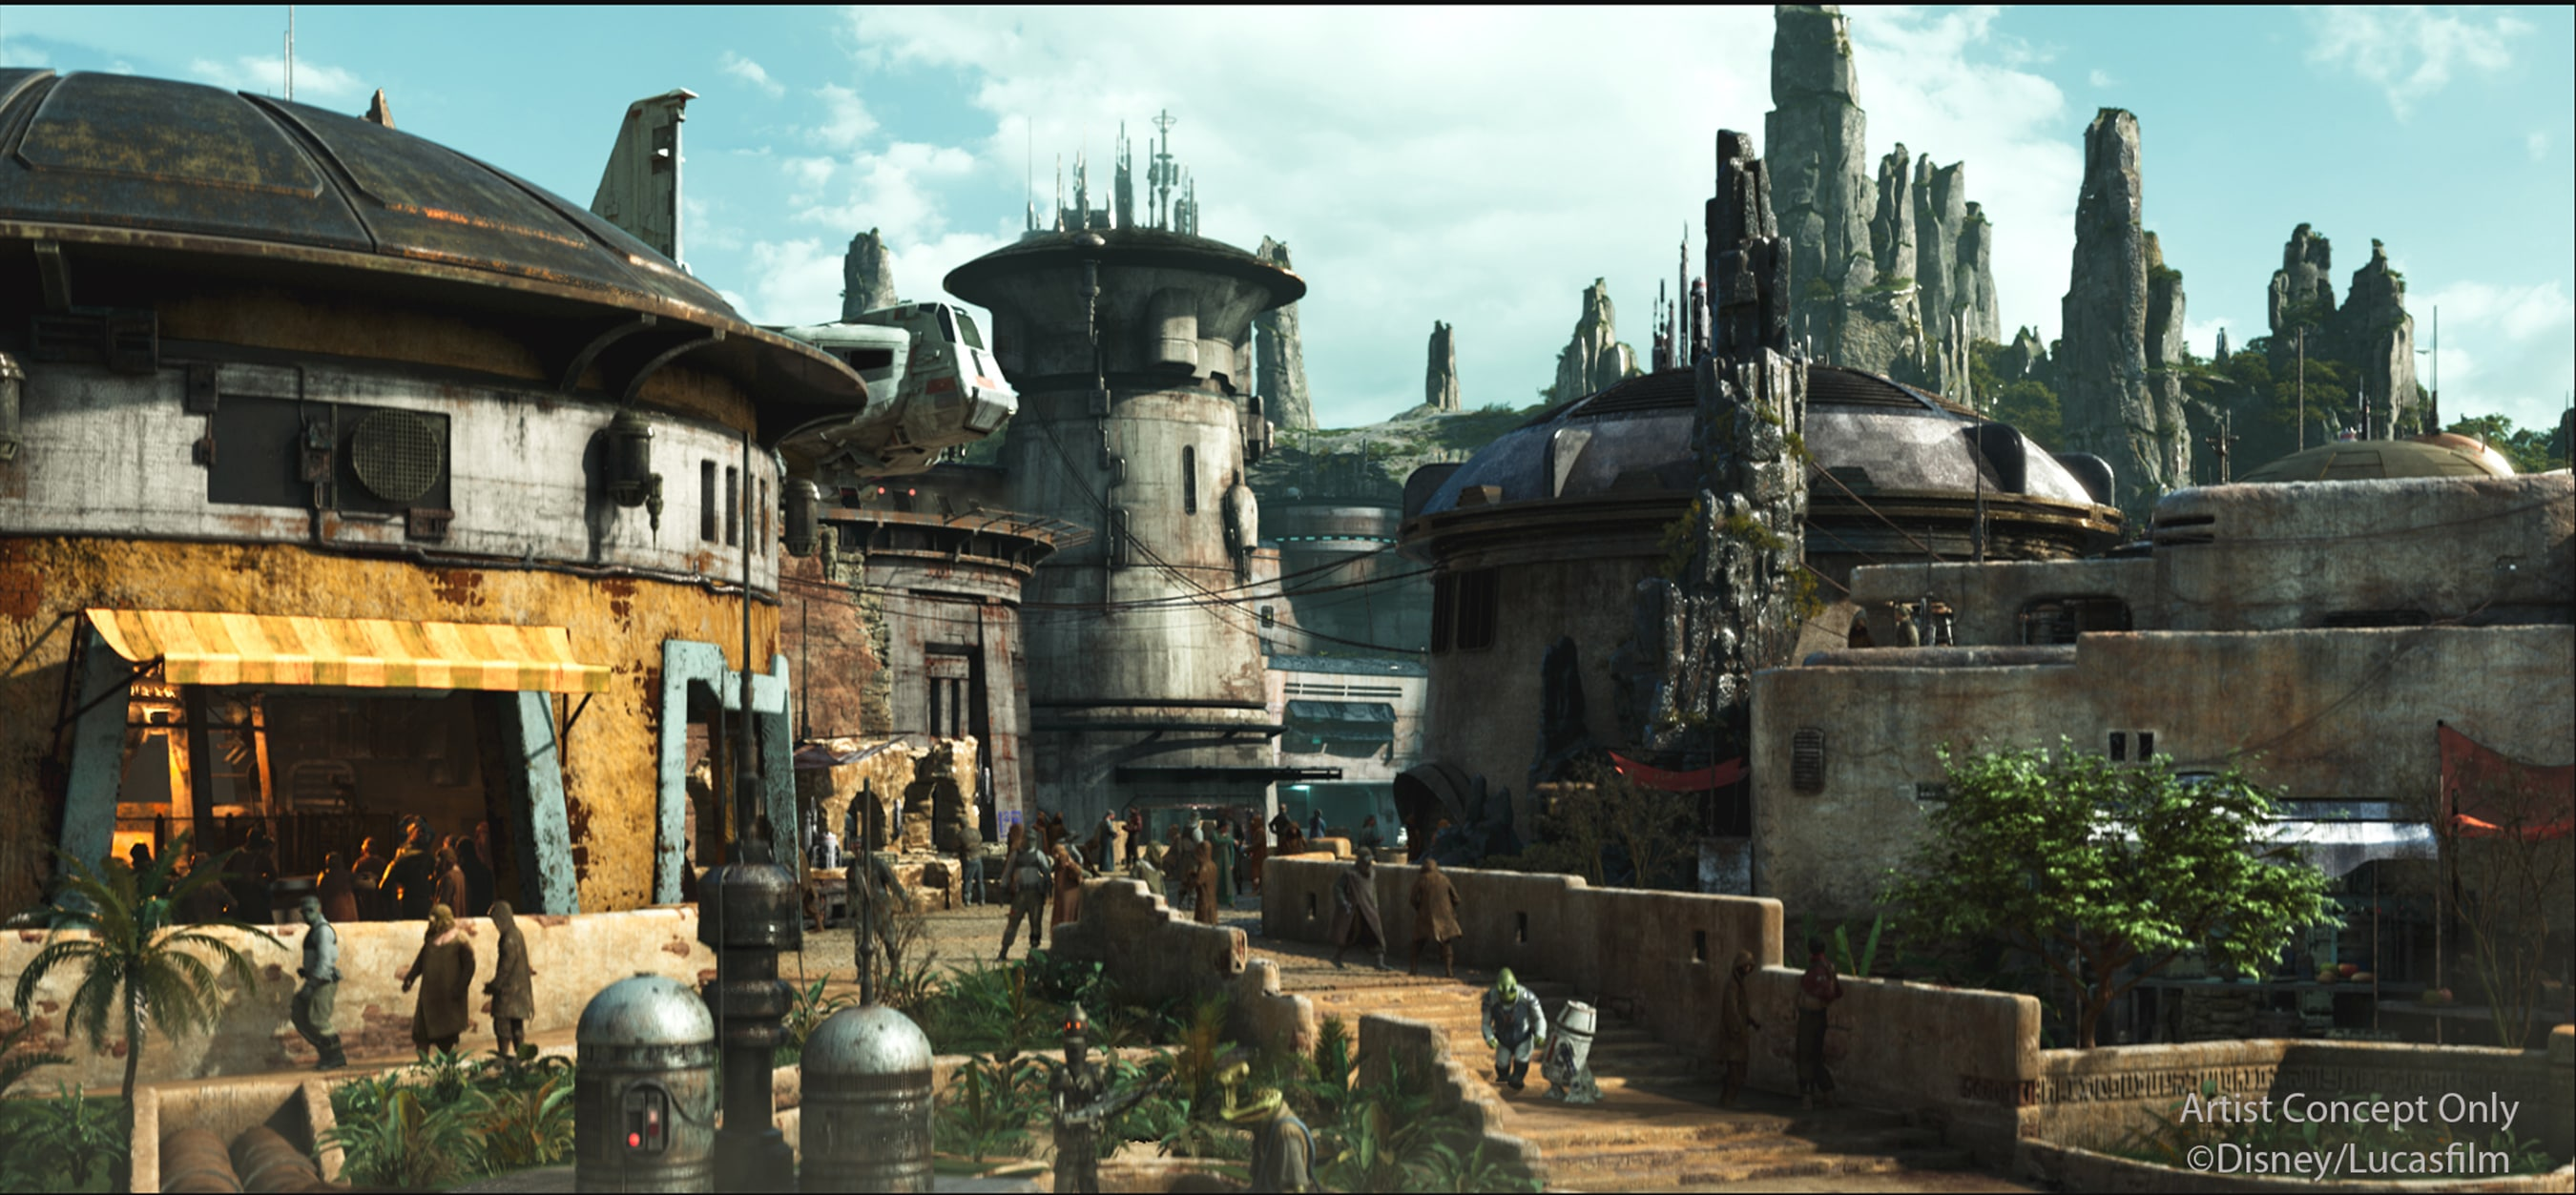 Star Wars Galaxy's Edge coming to Hollywood Studios in late Fall 2019 #disneyworld #hollywoodstudios #starwars #galaxysedge